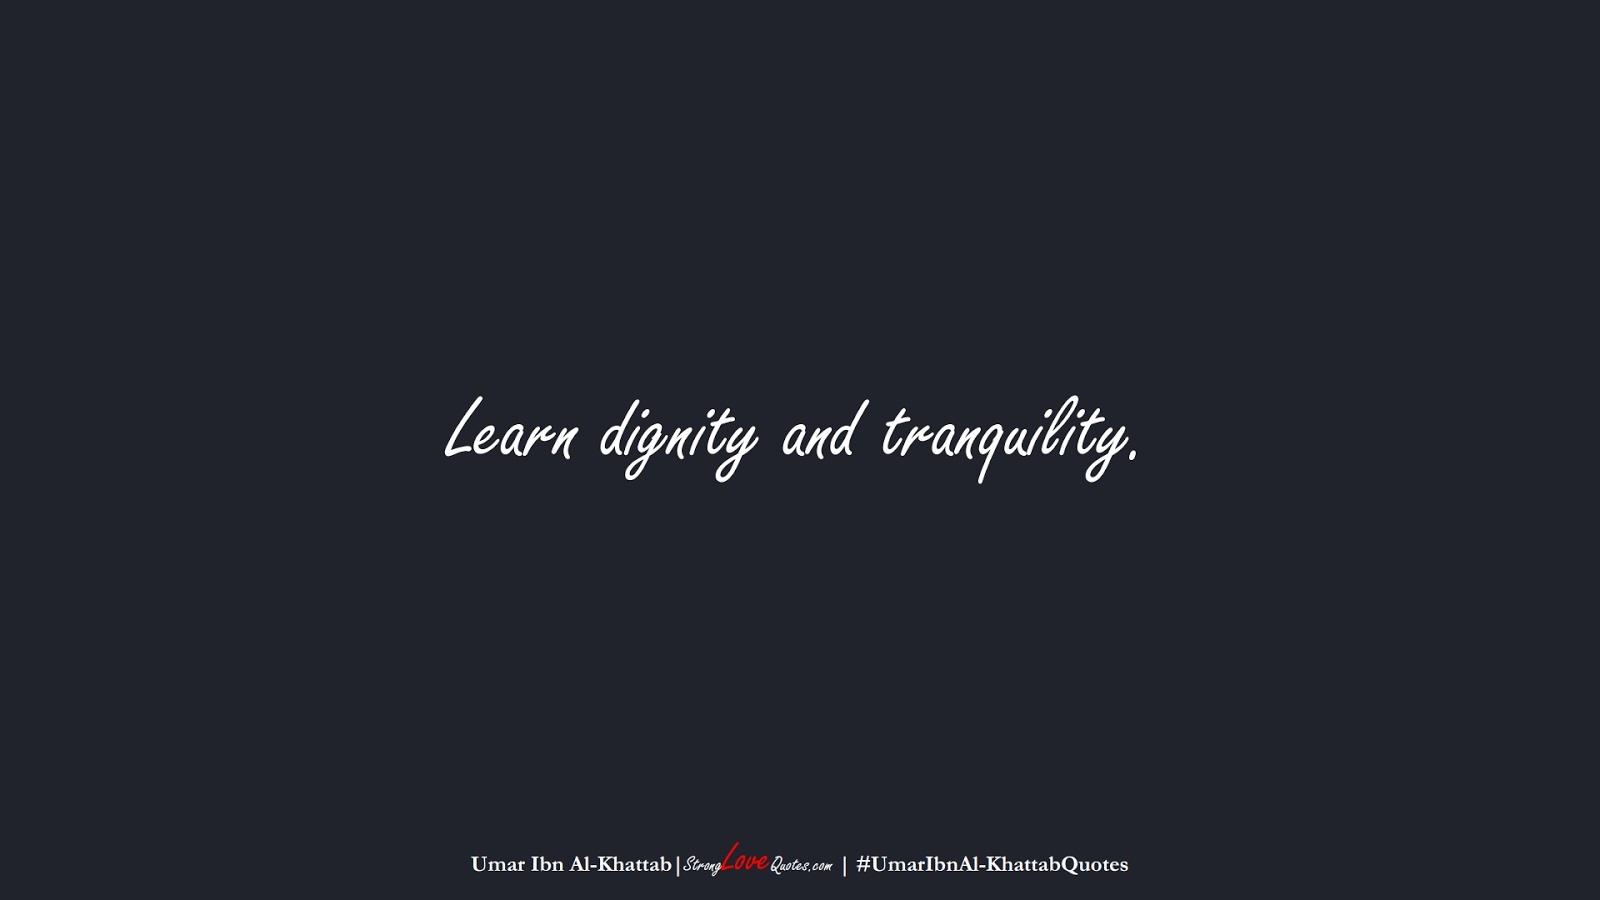 Learn dignity and tranquility. (Umar Ibn Al-Khattab);  #UmarIbnAl-KhattabQuotes